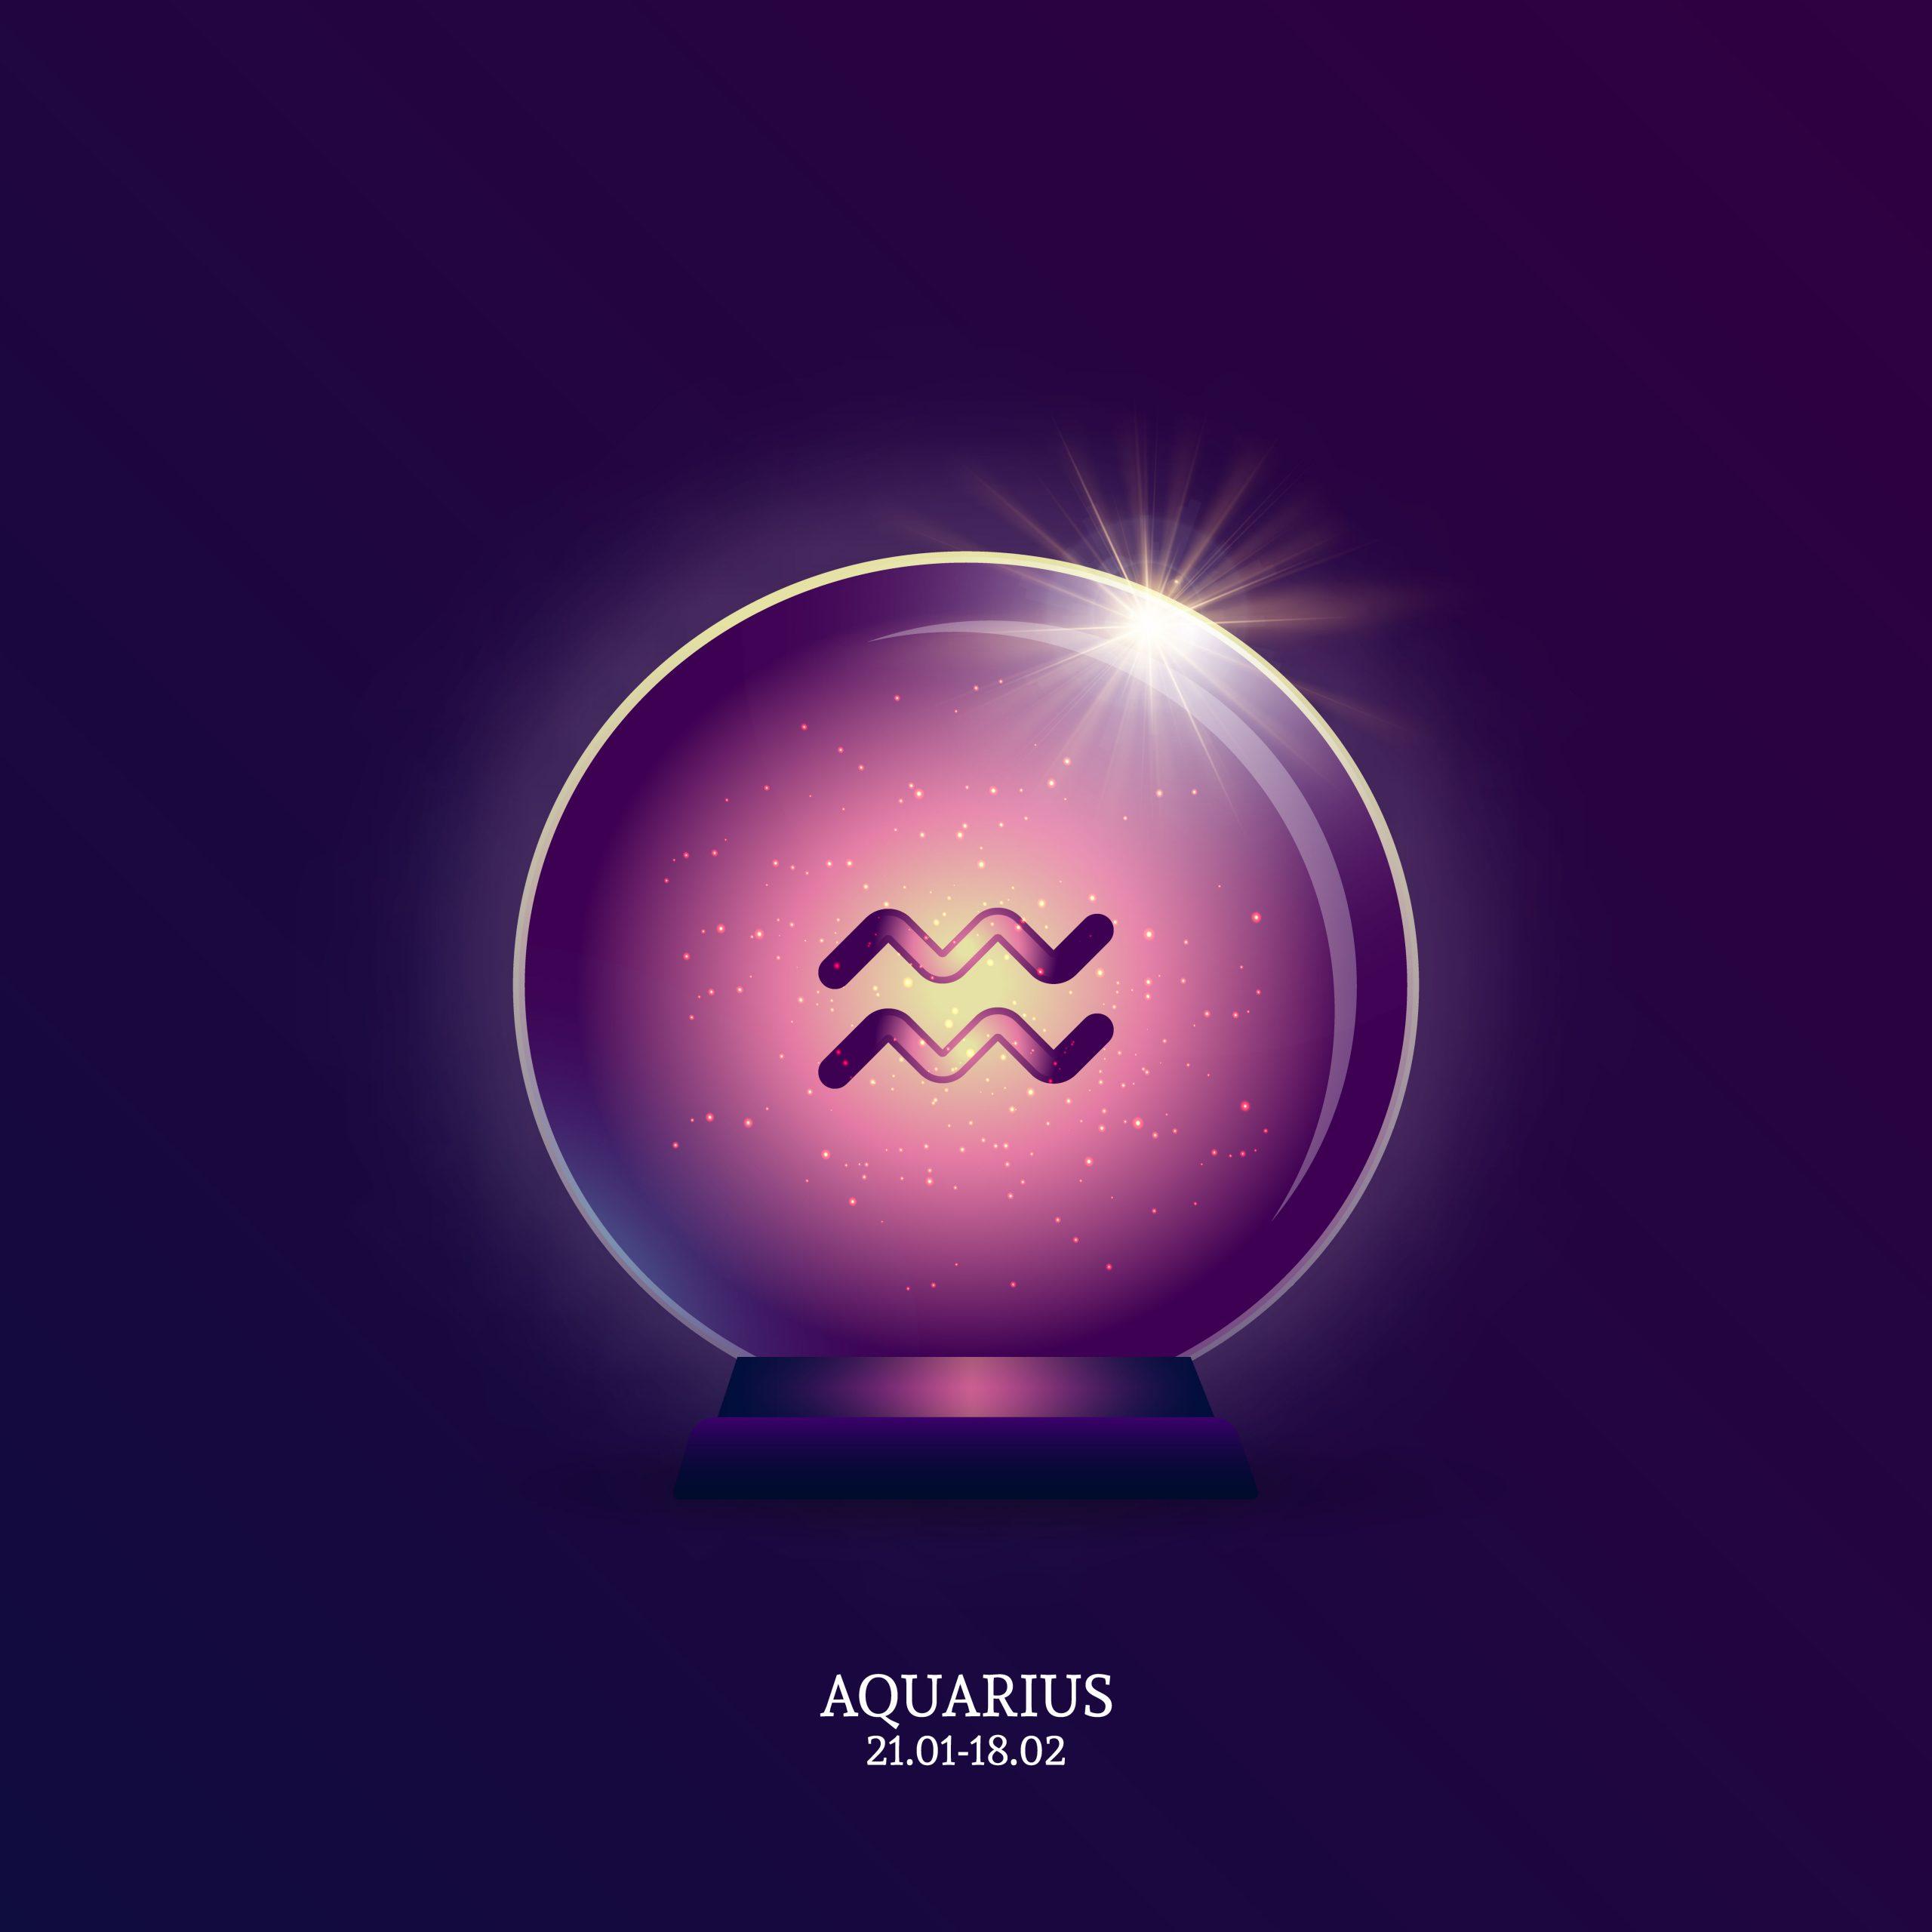 Aquarius zodiac astrology sign crystals for Aquarius